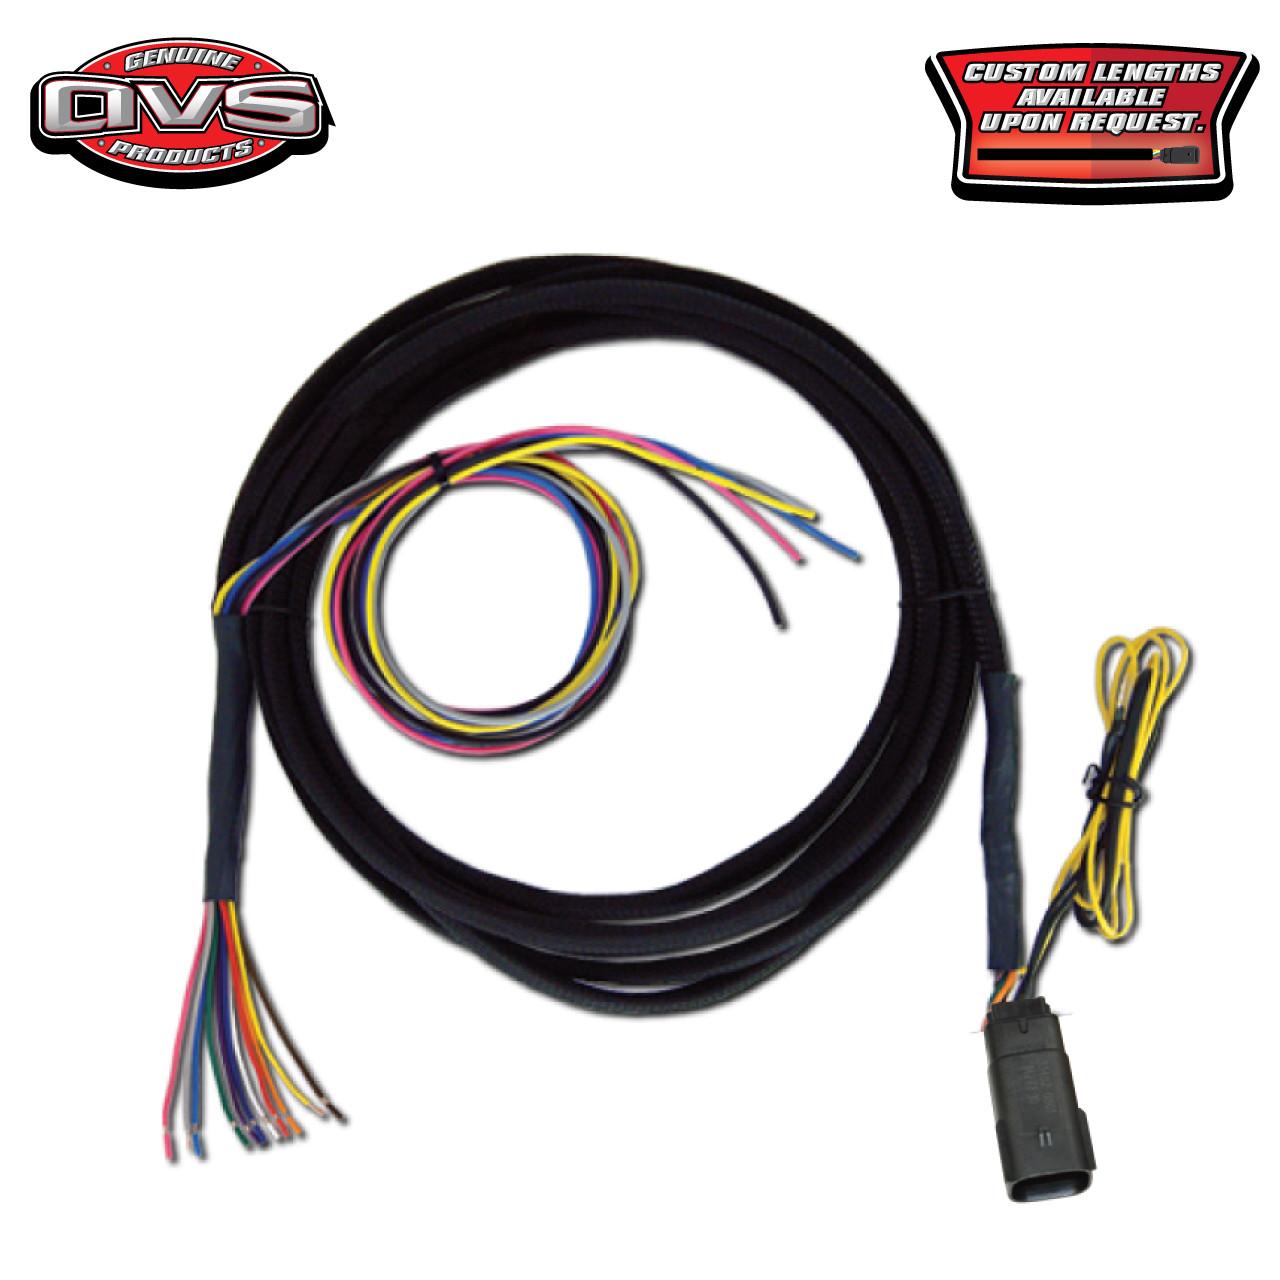 hight resolution of avs valve wiring harness 10 15 20 accuair vx4 valve